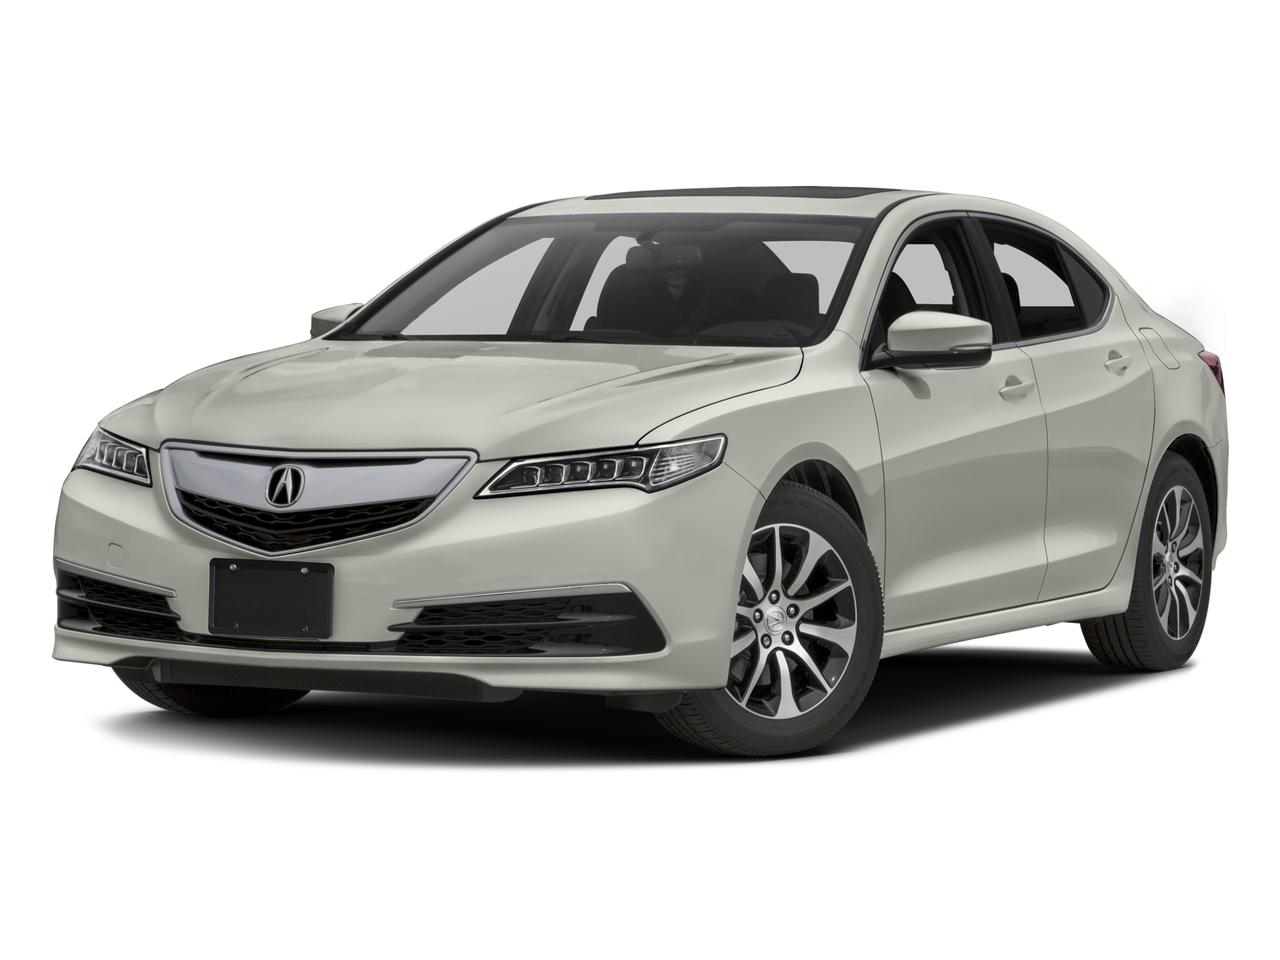 2016 Acura TLX Vehicle Photo in San Antonio, TX 78238